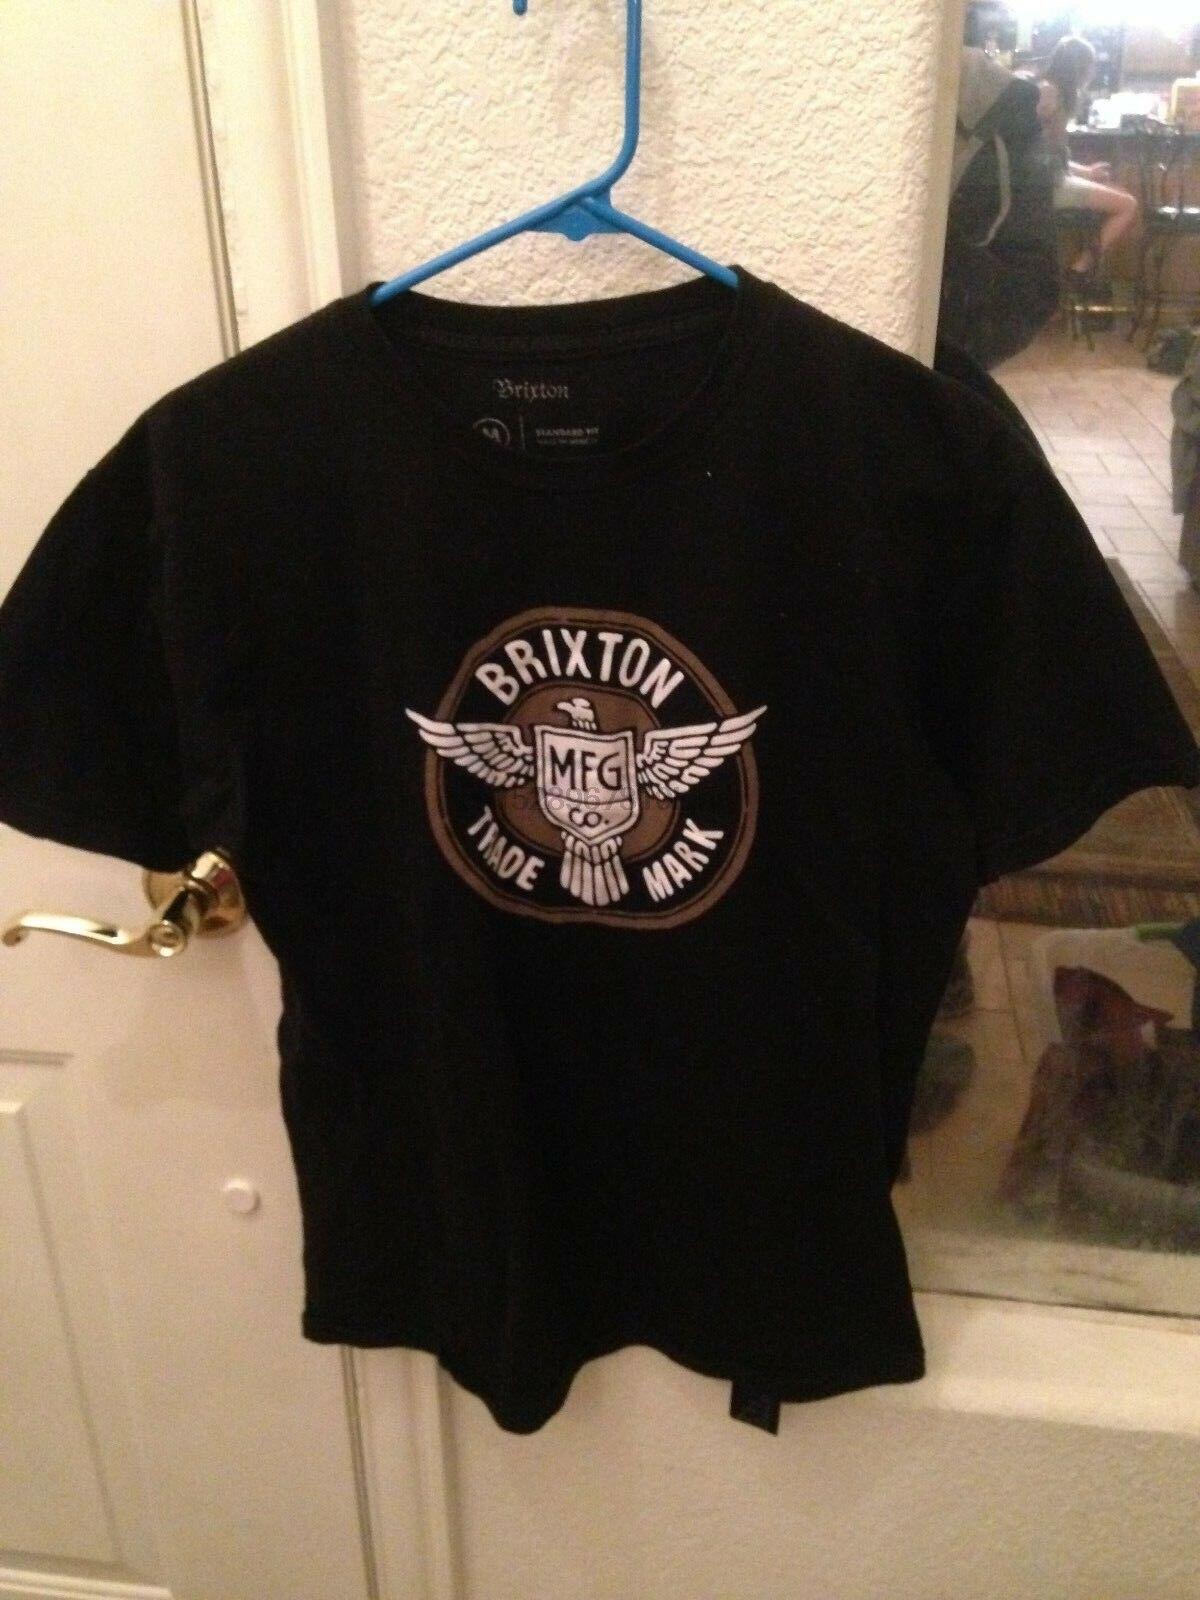 Camiseta de marca Brixton Mfg Co talla media negra